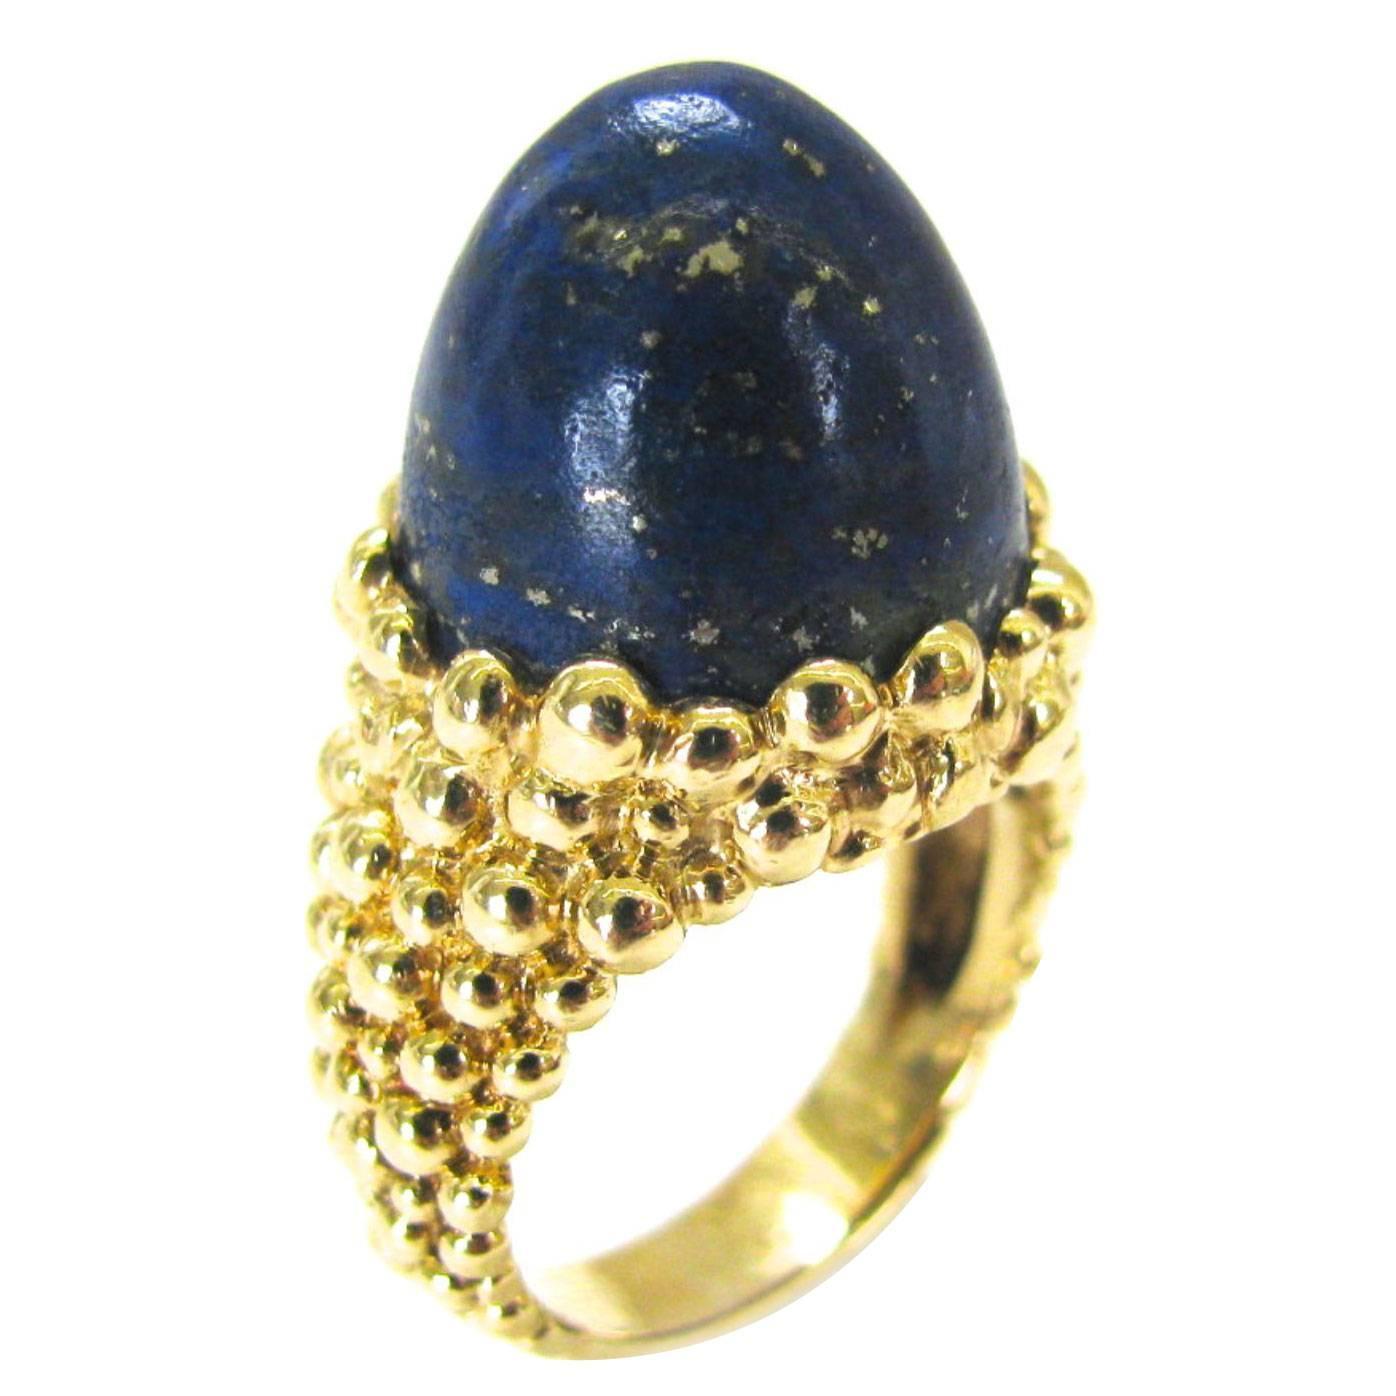 Kutchinsky, ring, circa 1970. Foto Kimberly Klosterman, goud, lapis lazuli